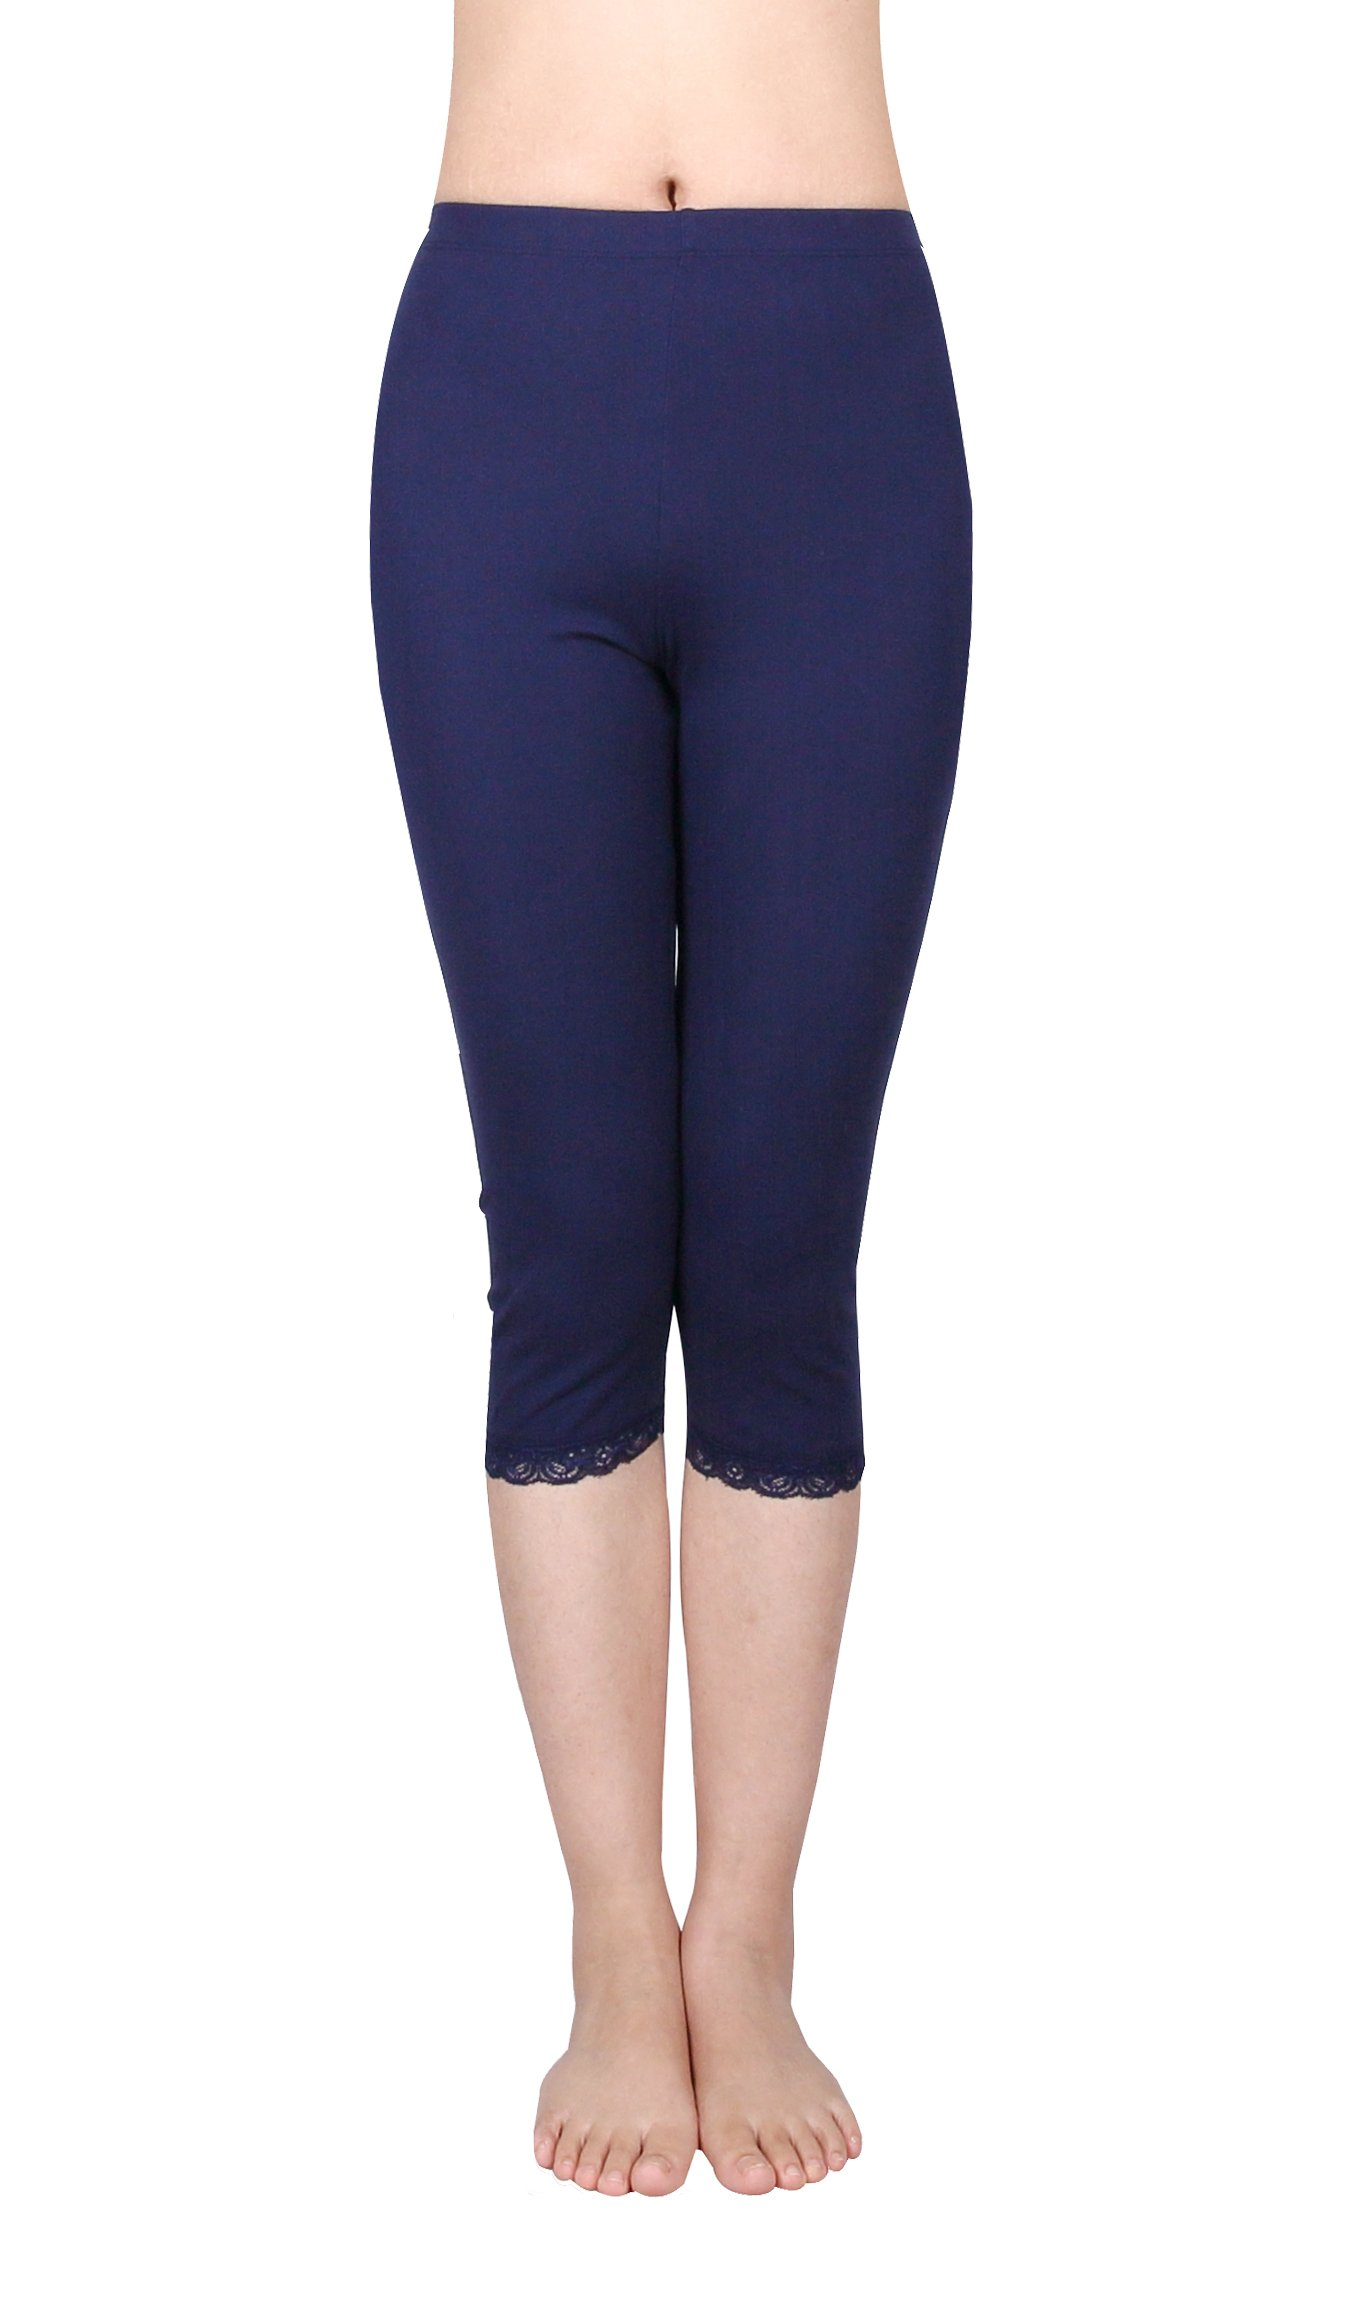 IRELIA 2 Pack Cotton Girls Leggings Capri with Lace Trim Pant Size 6-16 03 M by IRELIA (Image #2)